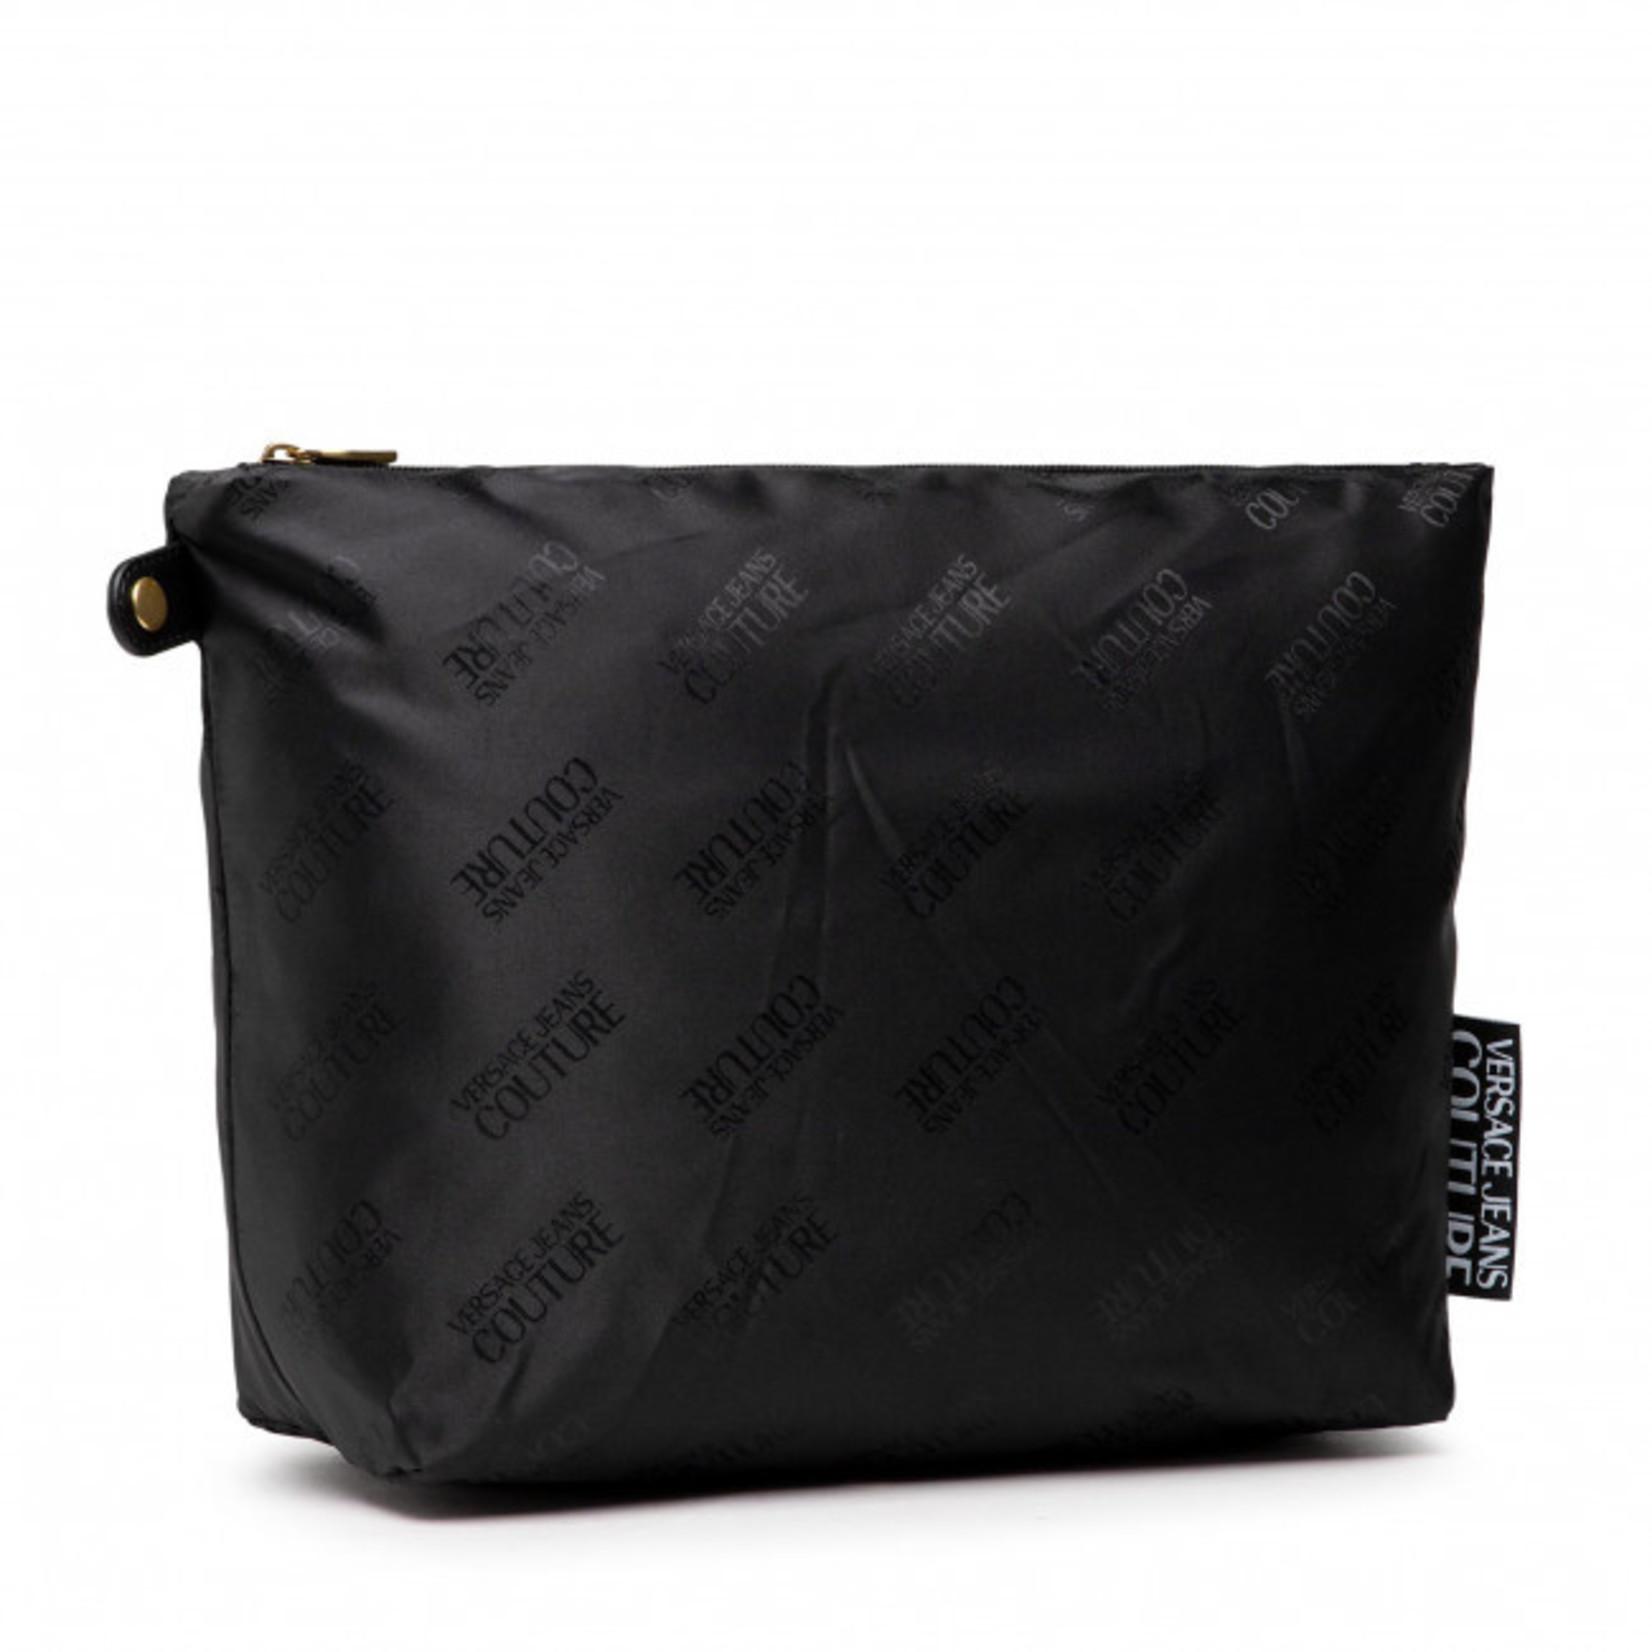 VERSACE JEANS COUTURE VERSACE JEANS COUTURE WOMEN'S BAG RANGE 4 STRIPE PATCHWORK - 71VA4B46